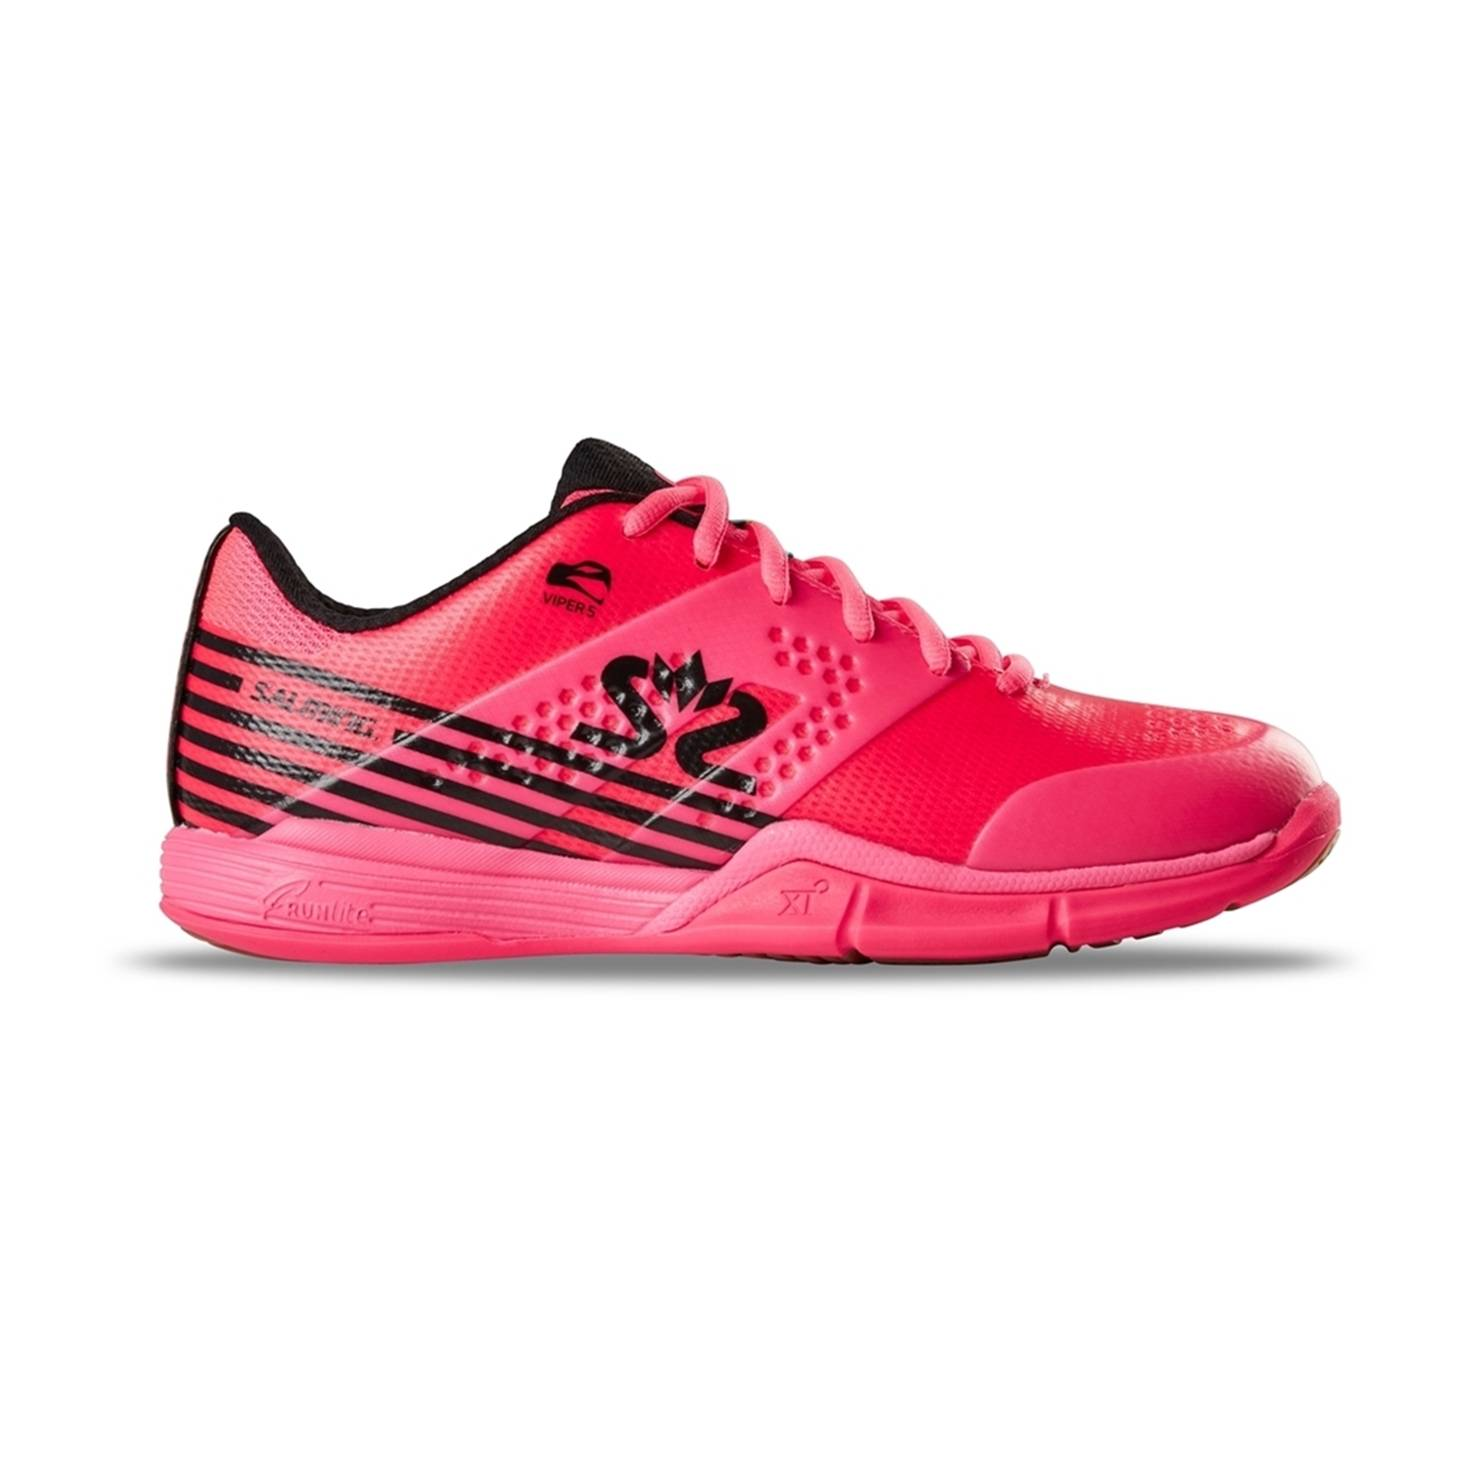 Salming Viper 5 Women Pink/Black 36 2/3